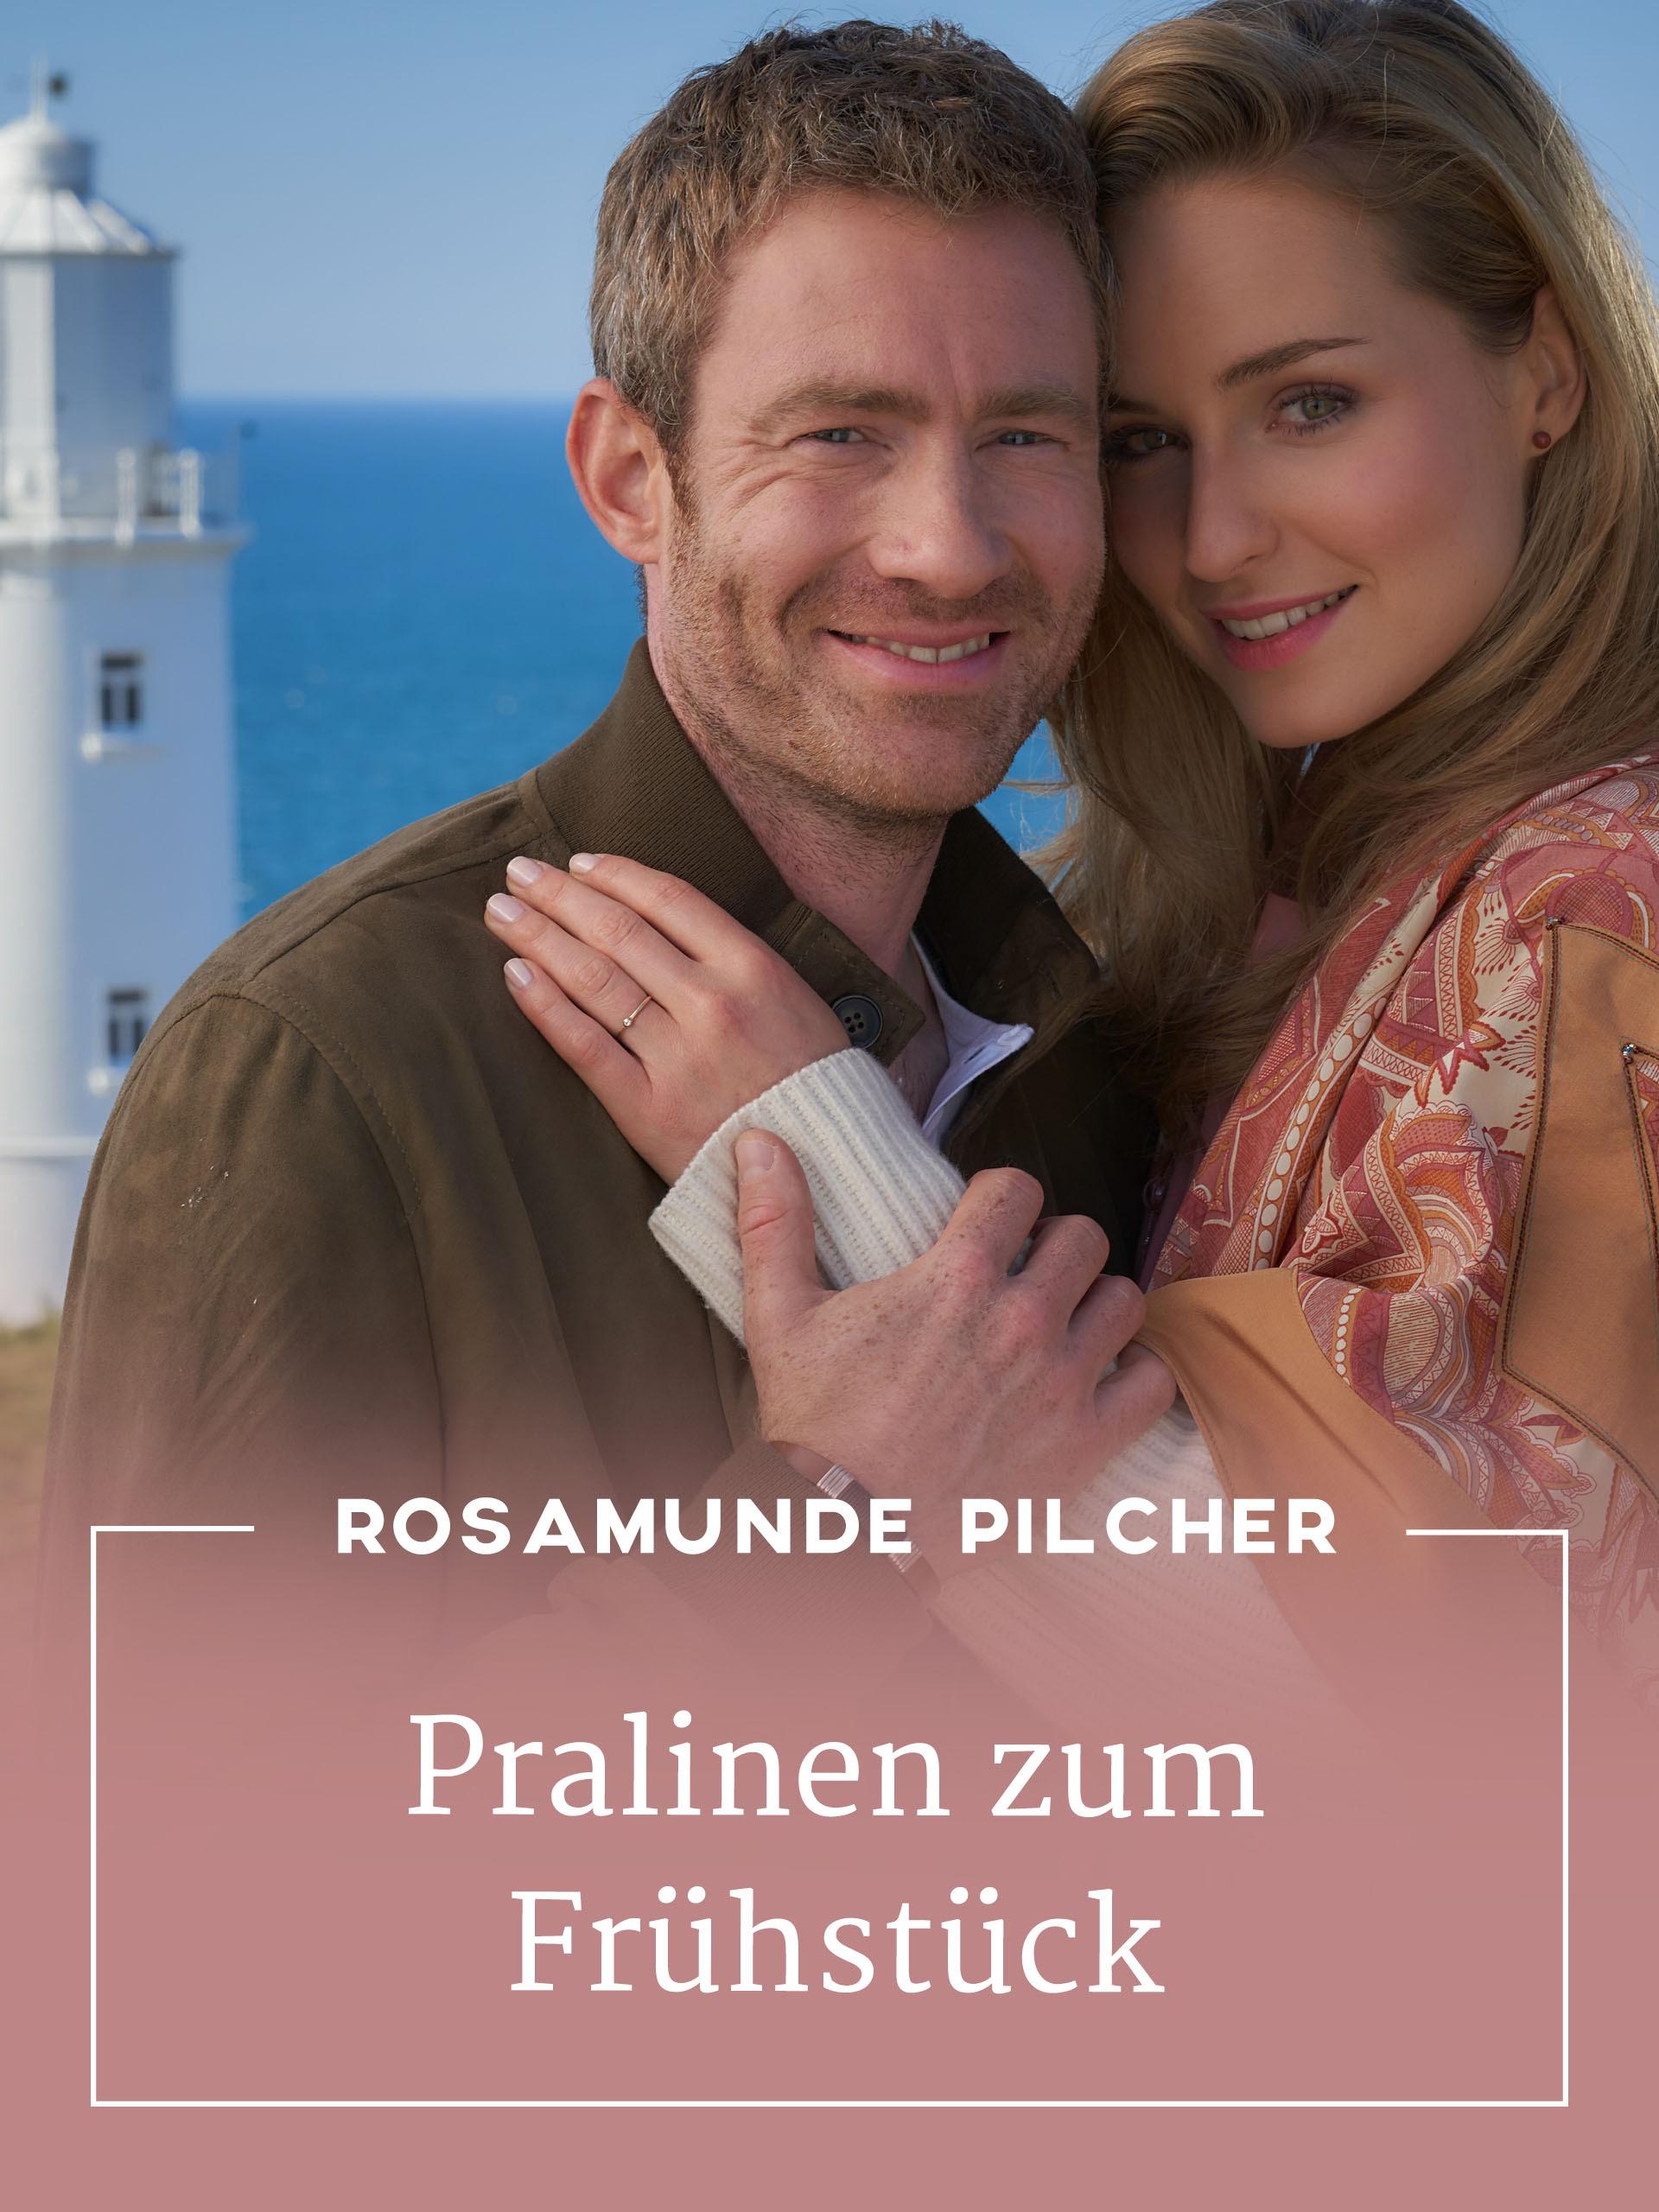 Rosamunde Pilcher - Pralinen zum Frühstück